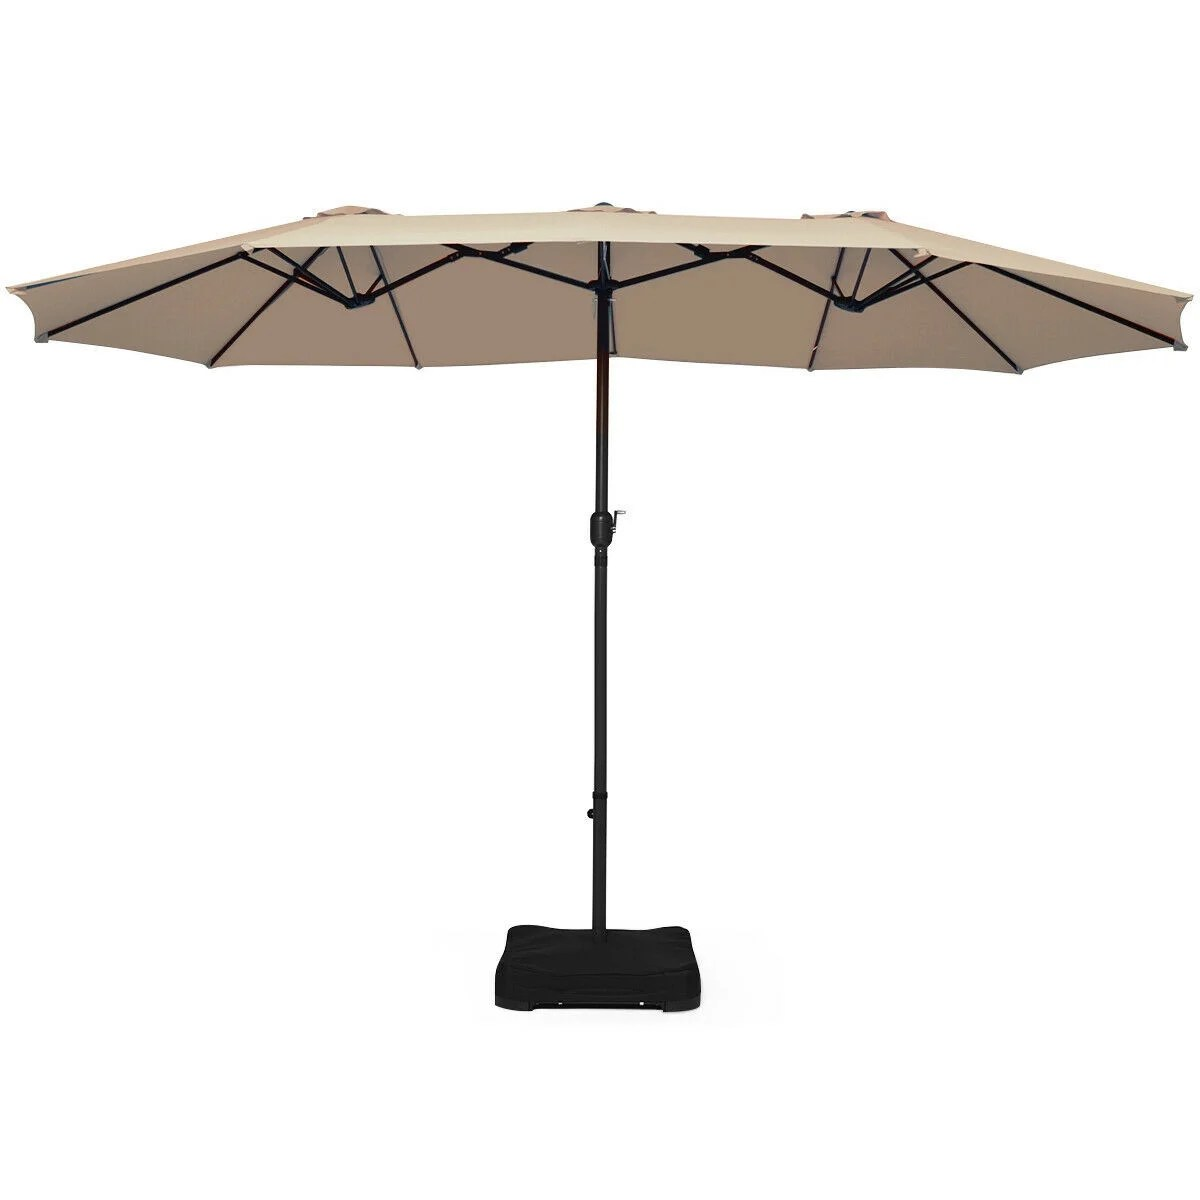 15 ft patio umbrella outdoor umbrella with crank base